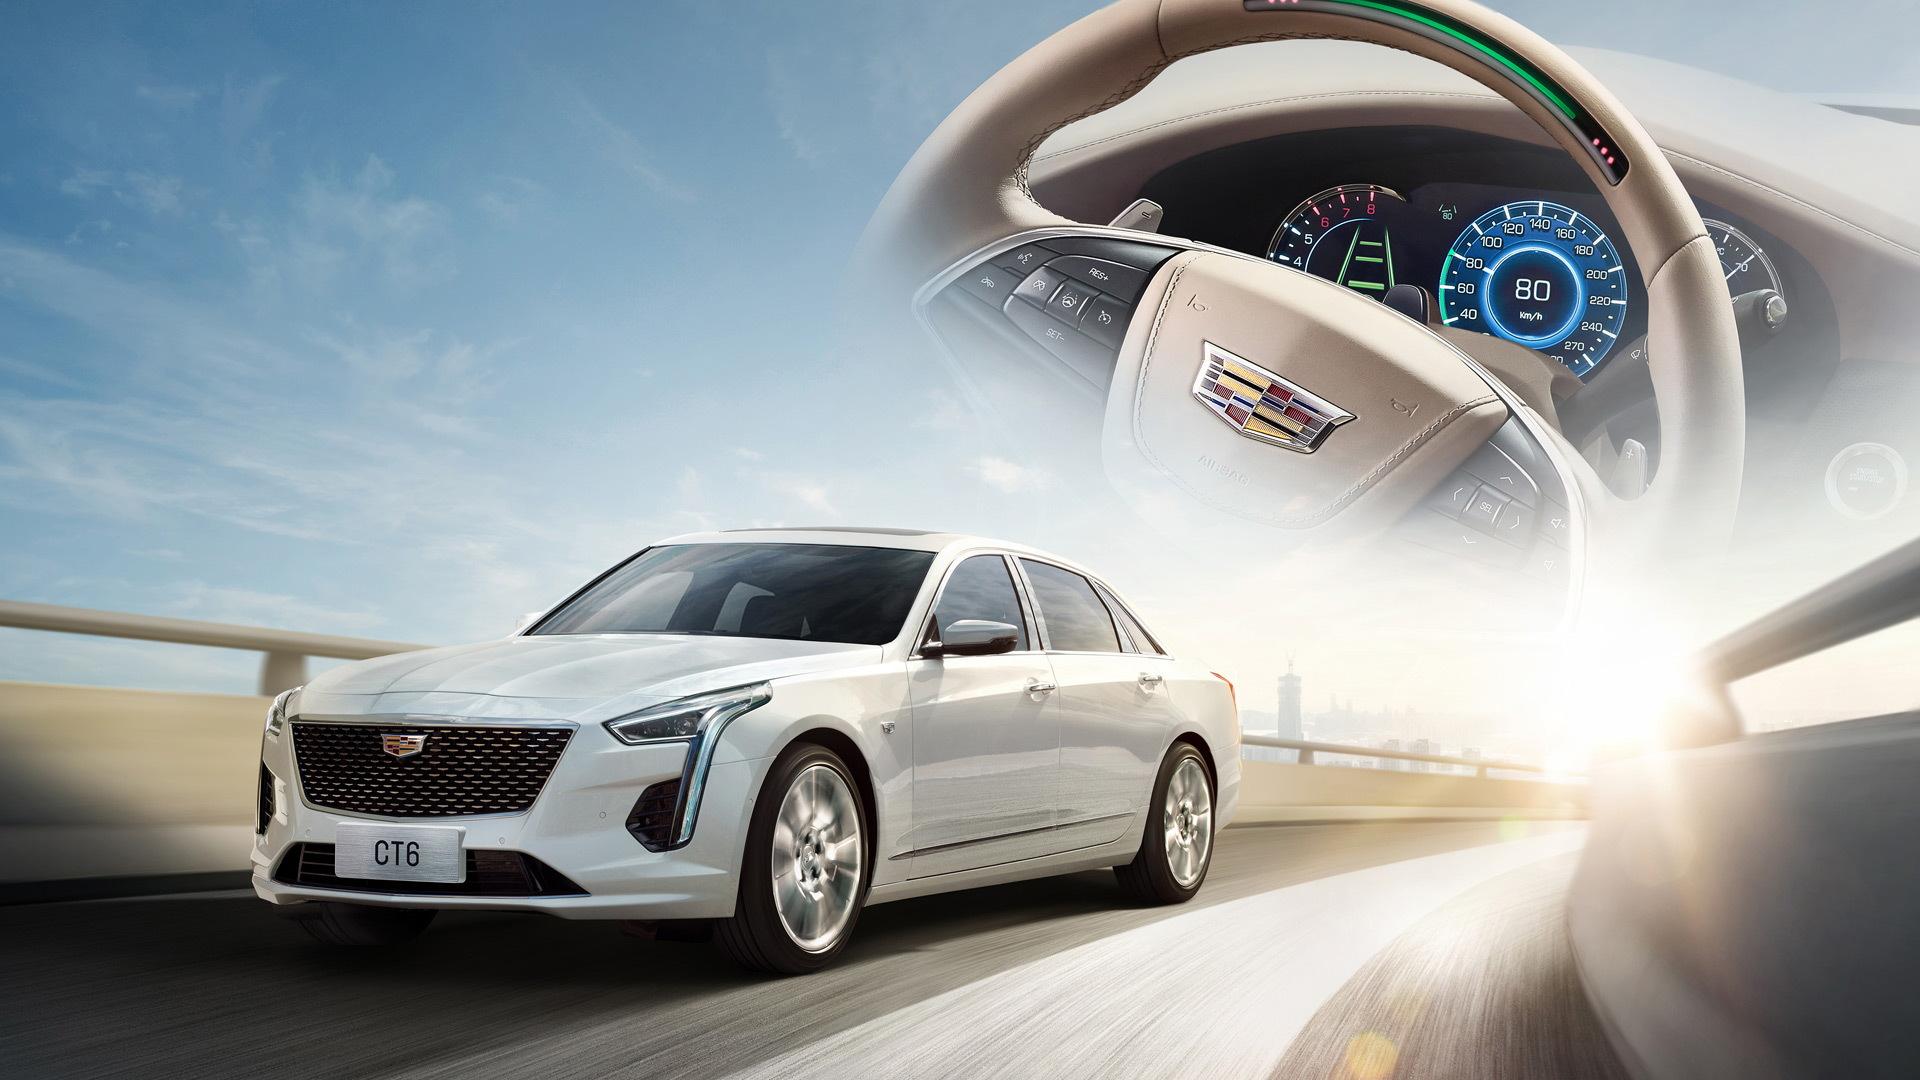 2021 Cadillac CT6 (China spec)